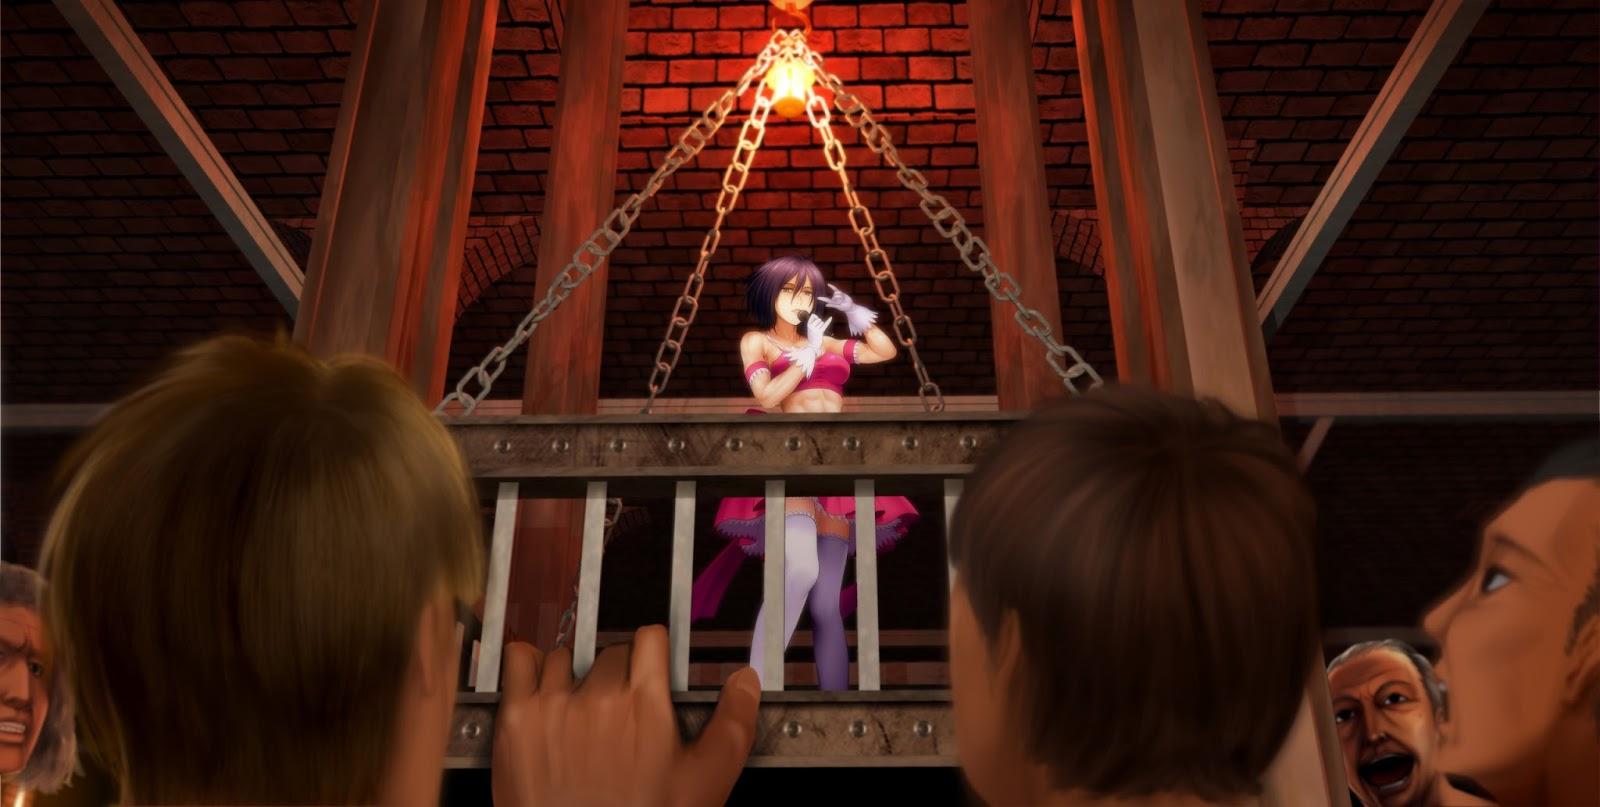 Abs Girl Female Attack on Titan Shingeki no Kyojin Anime HD WallpaperShingeki No Kyojin Mikasa Abs